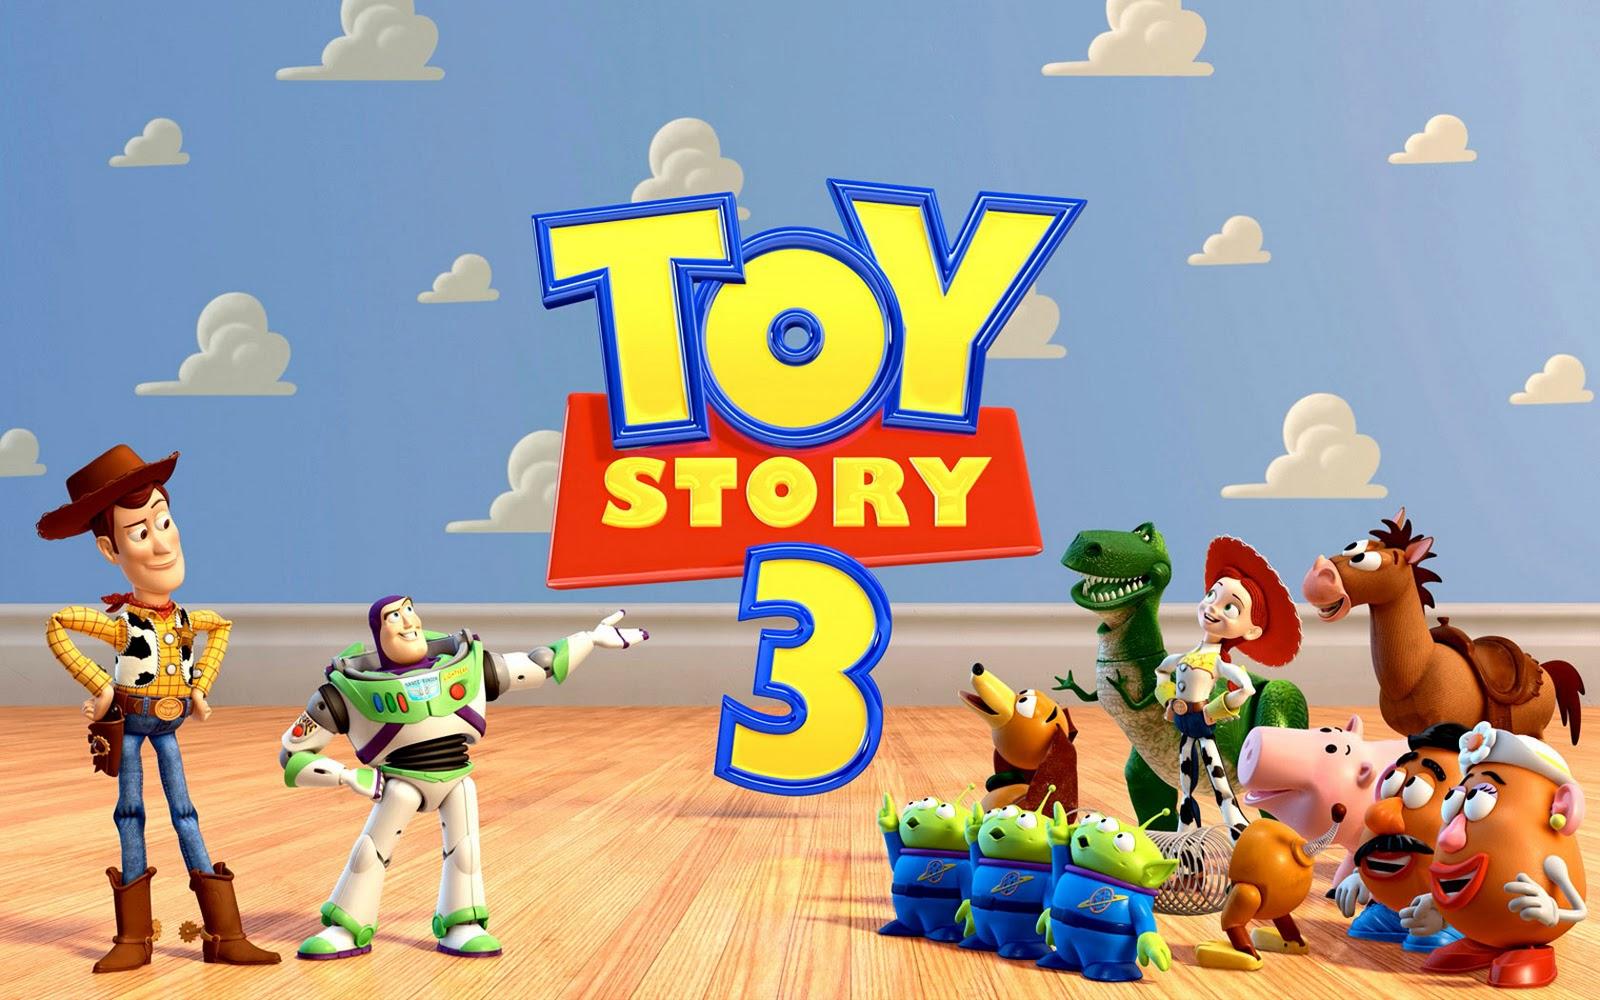 http://2.bp.blogspot.com/_cLmFuhOAIao/TRUa9ZcdC_I/AAAAAAAAJvk/FxrdSctGdVc/s1600/toy-story-3-wallpaper-characters-logo.jpg